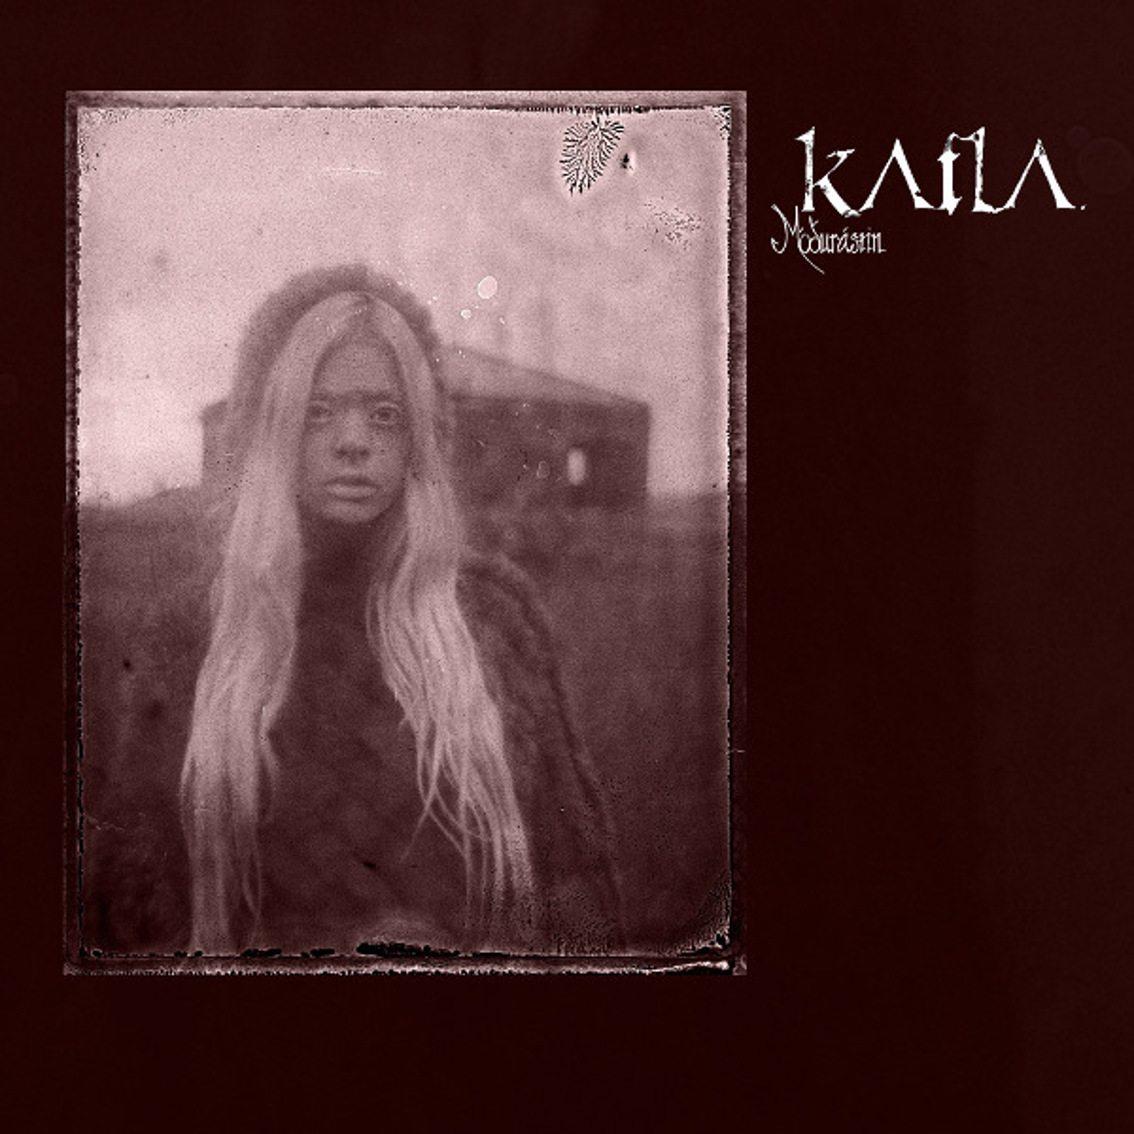 Icelandic act Katla debut'Móðurástin' out on CD, 2xLP vinyl and as a 2CD hardcover artbook